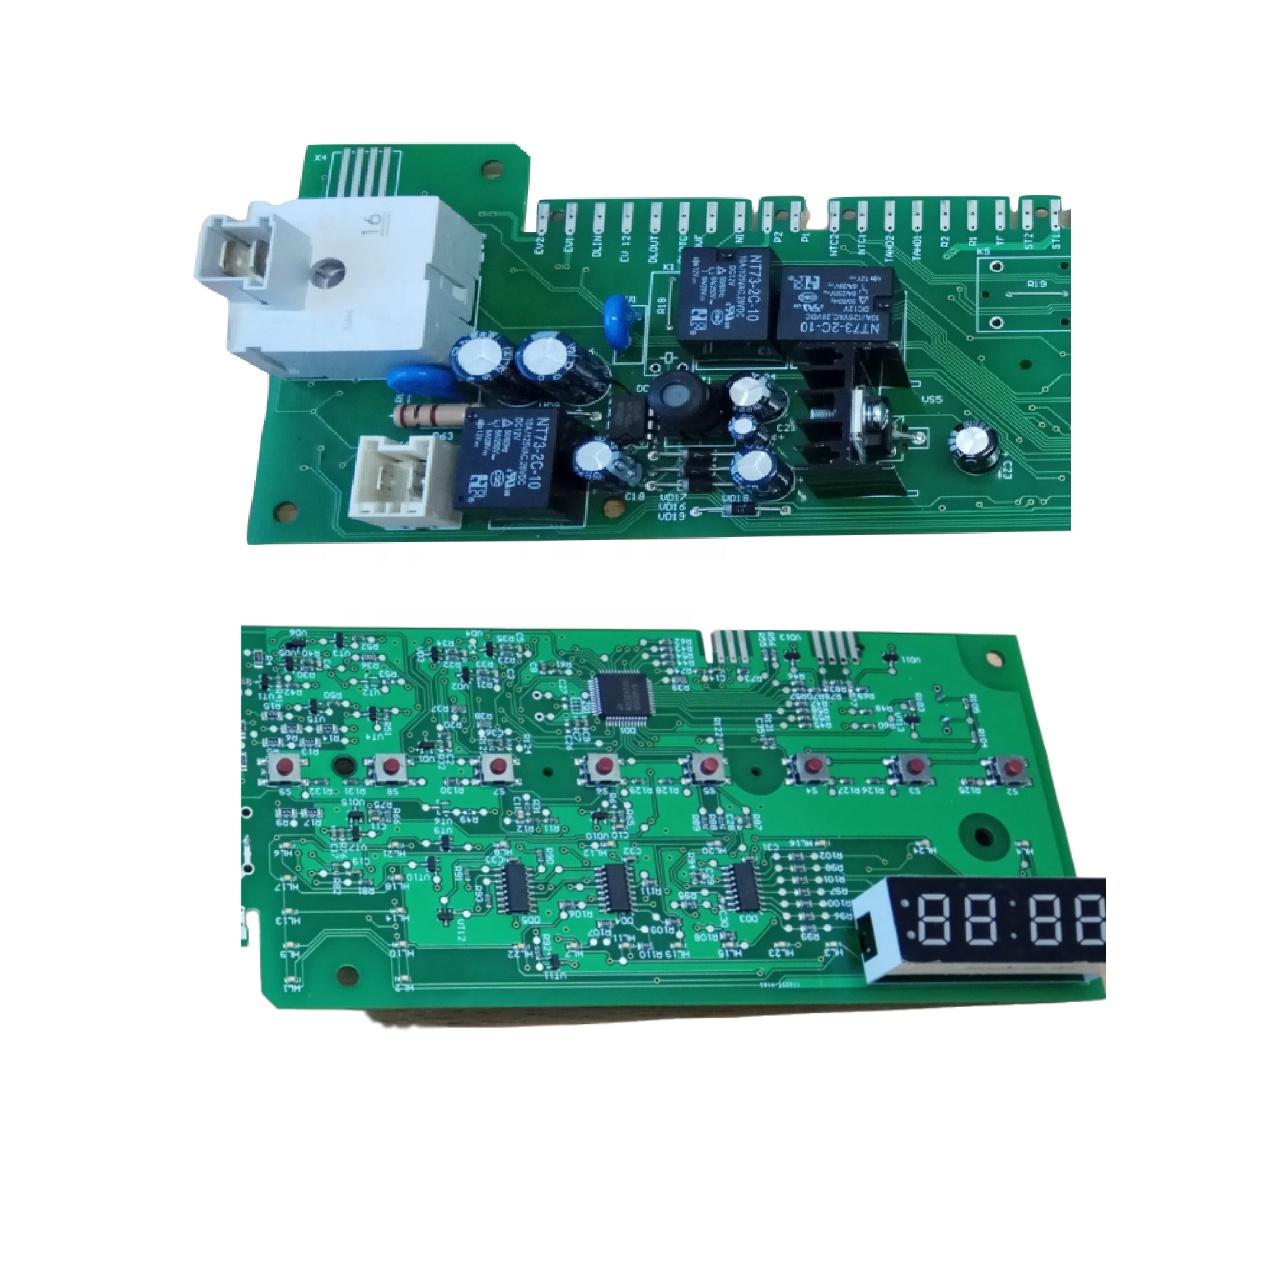 Drum washing machine control board Provide PCBA assembly service